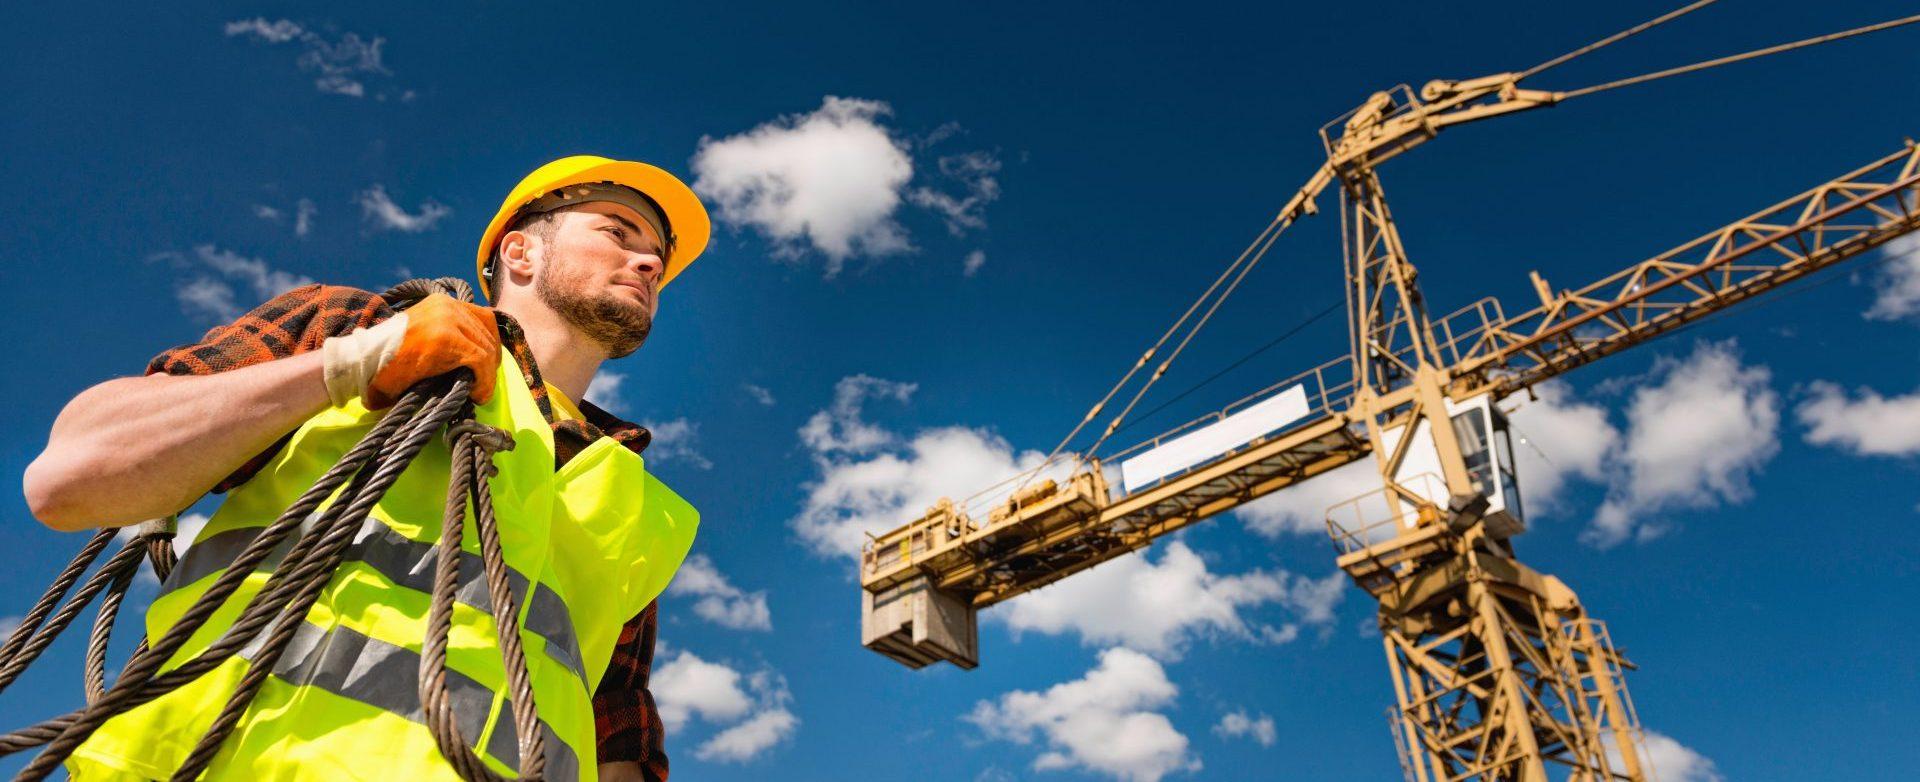 construction-public-liability-e1504258782380.jpg